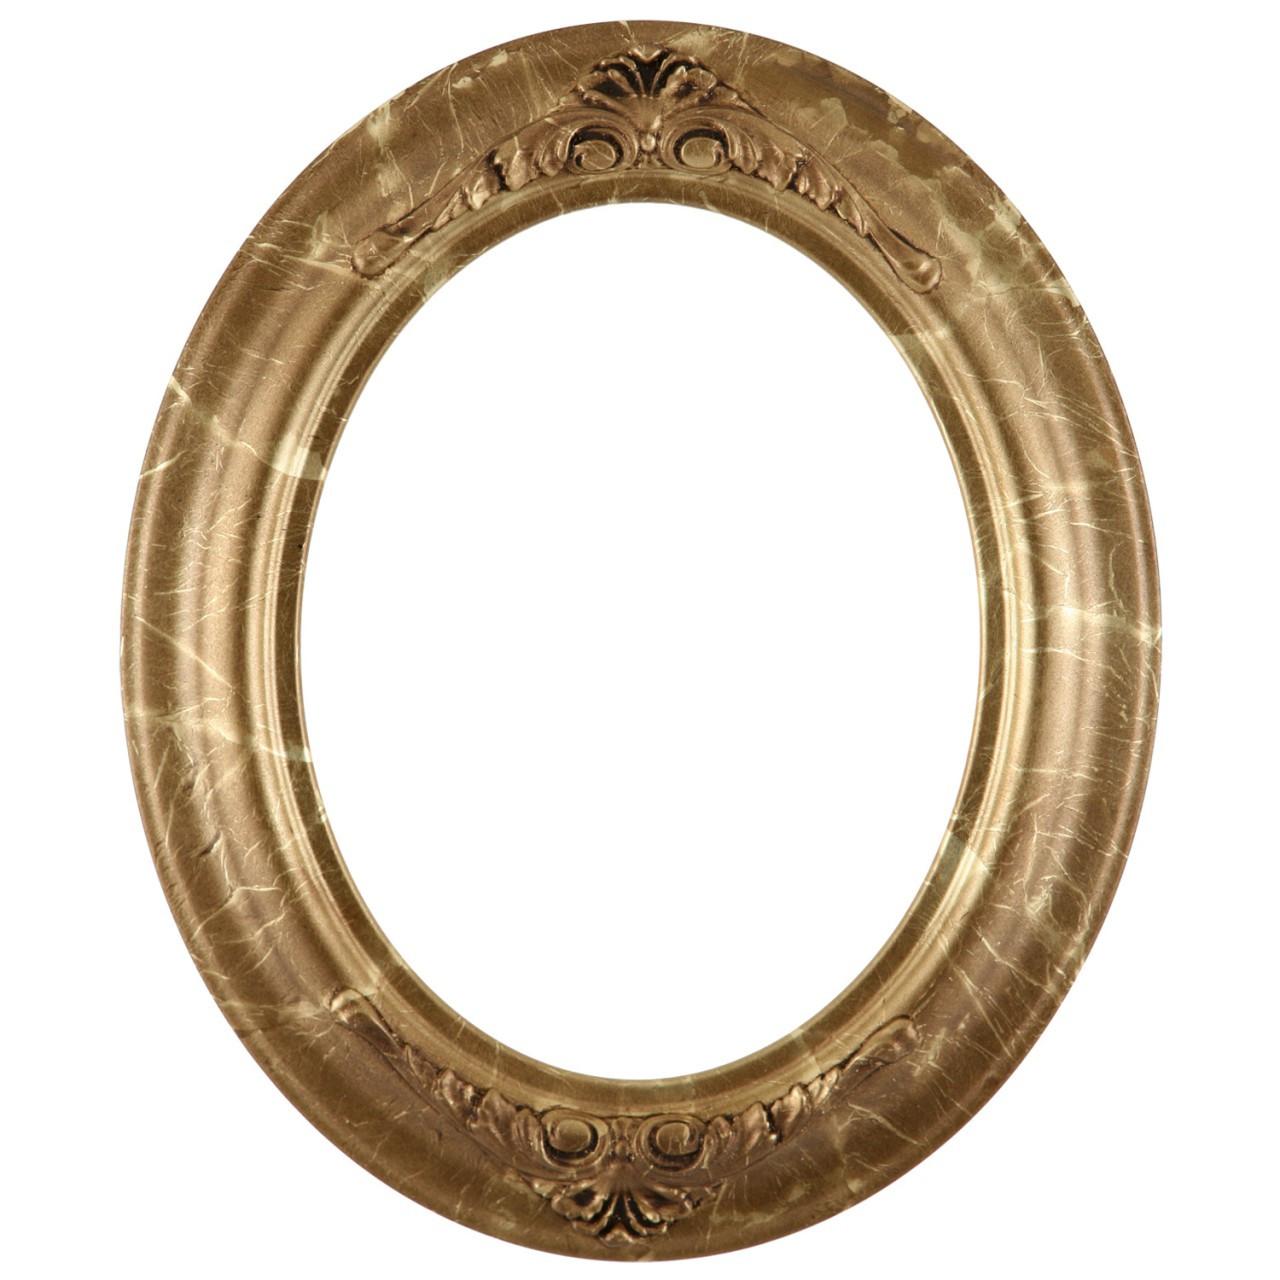 Oval Frame In Champagne Gold Finish Antique Gold Leaf